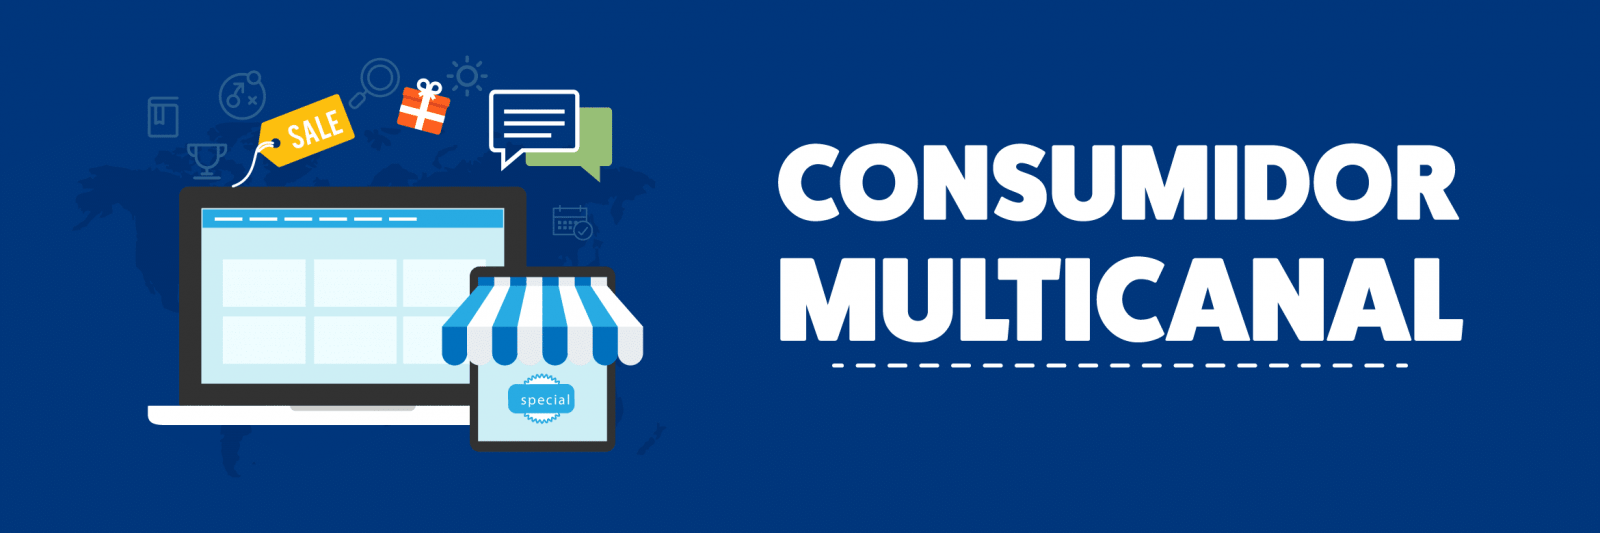 o consumidor multicanal